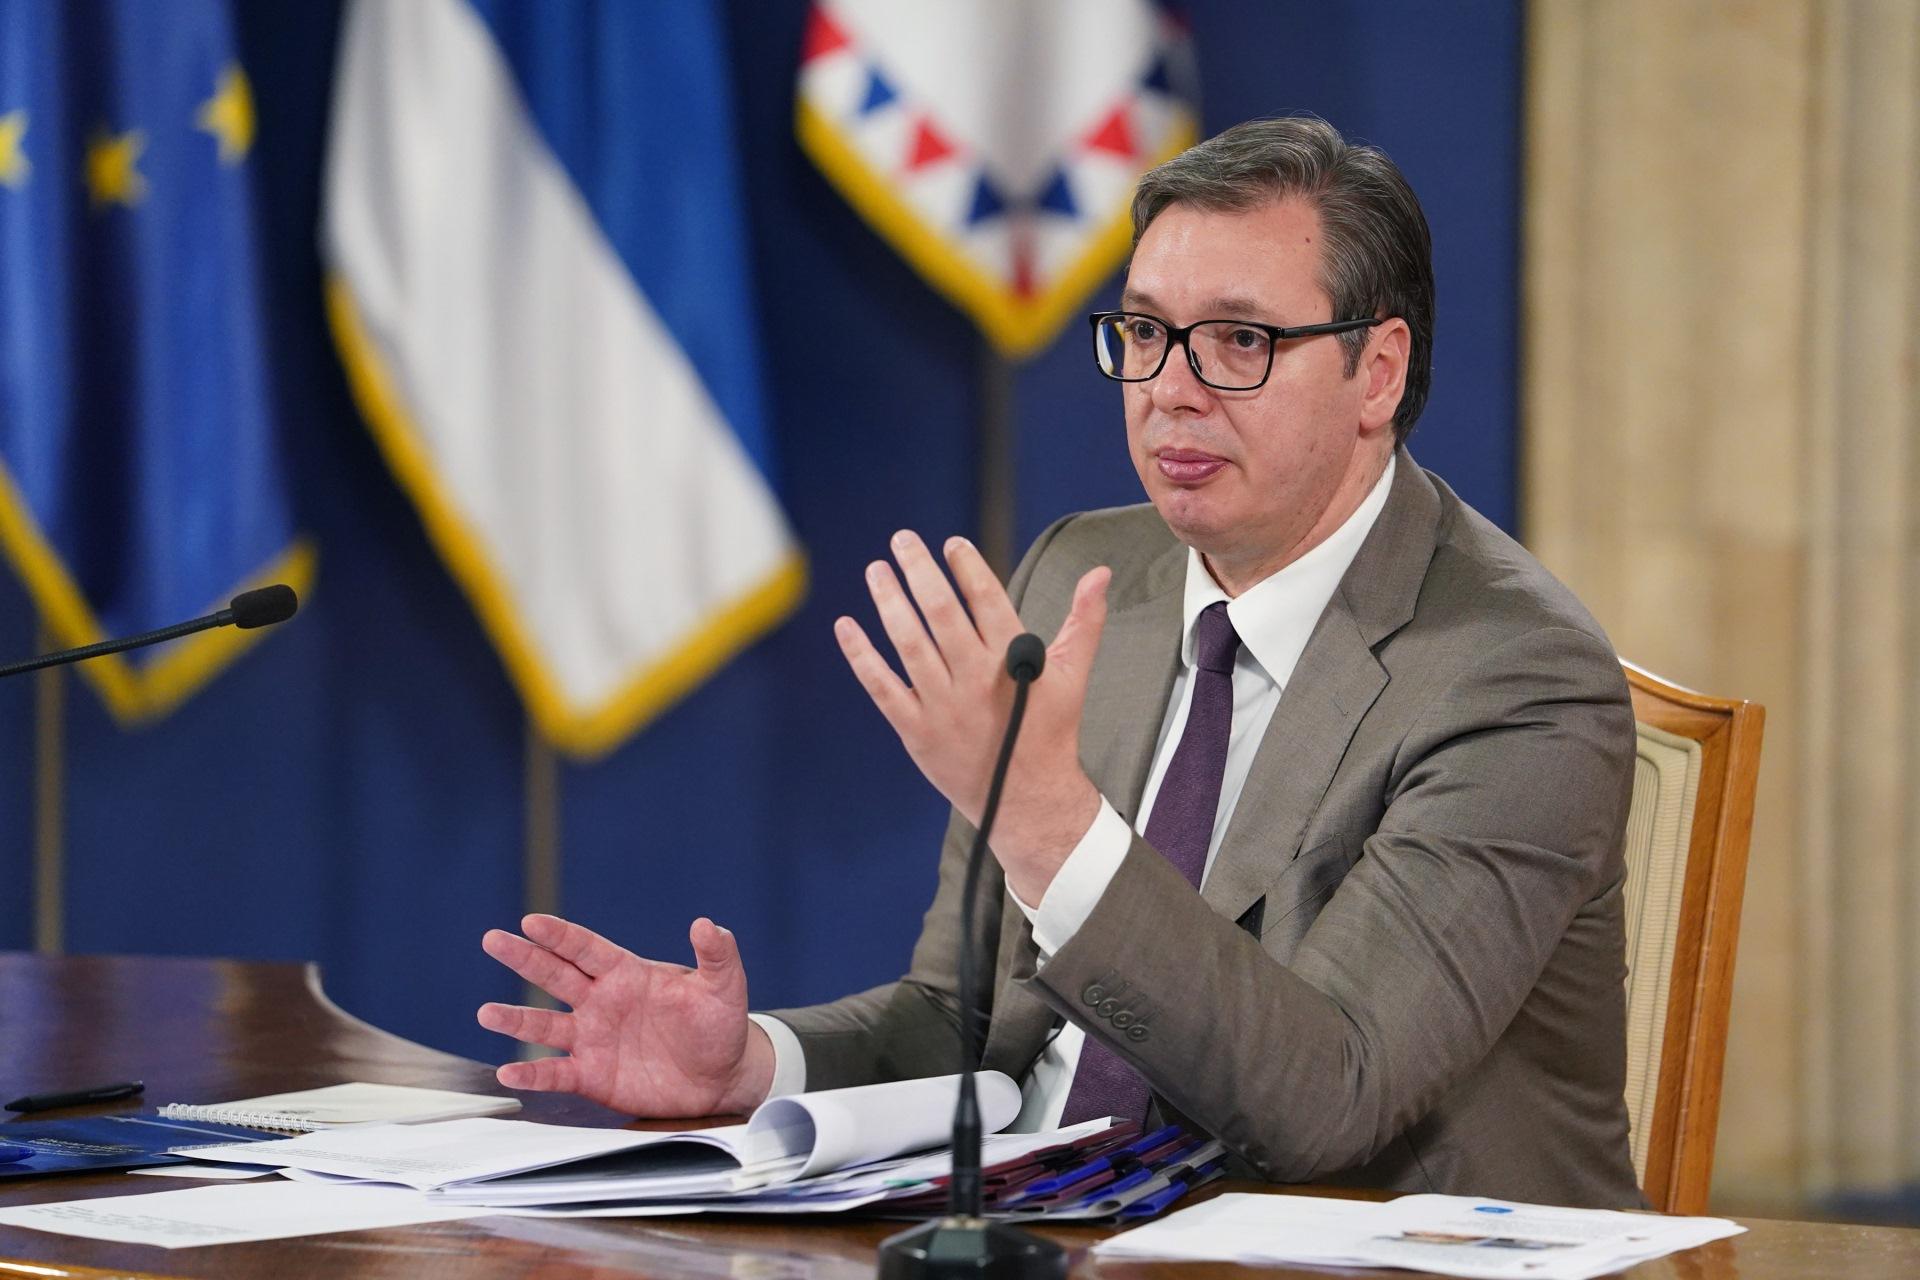 Predsednik Srbije Aleksandar Vucic Pristinska strana dosla s namerom da dijaloga nema